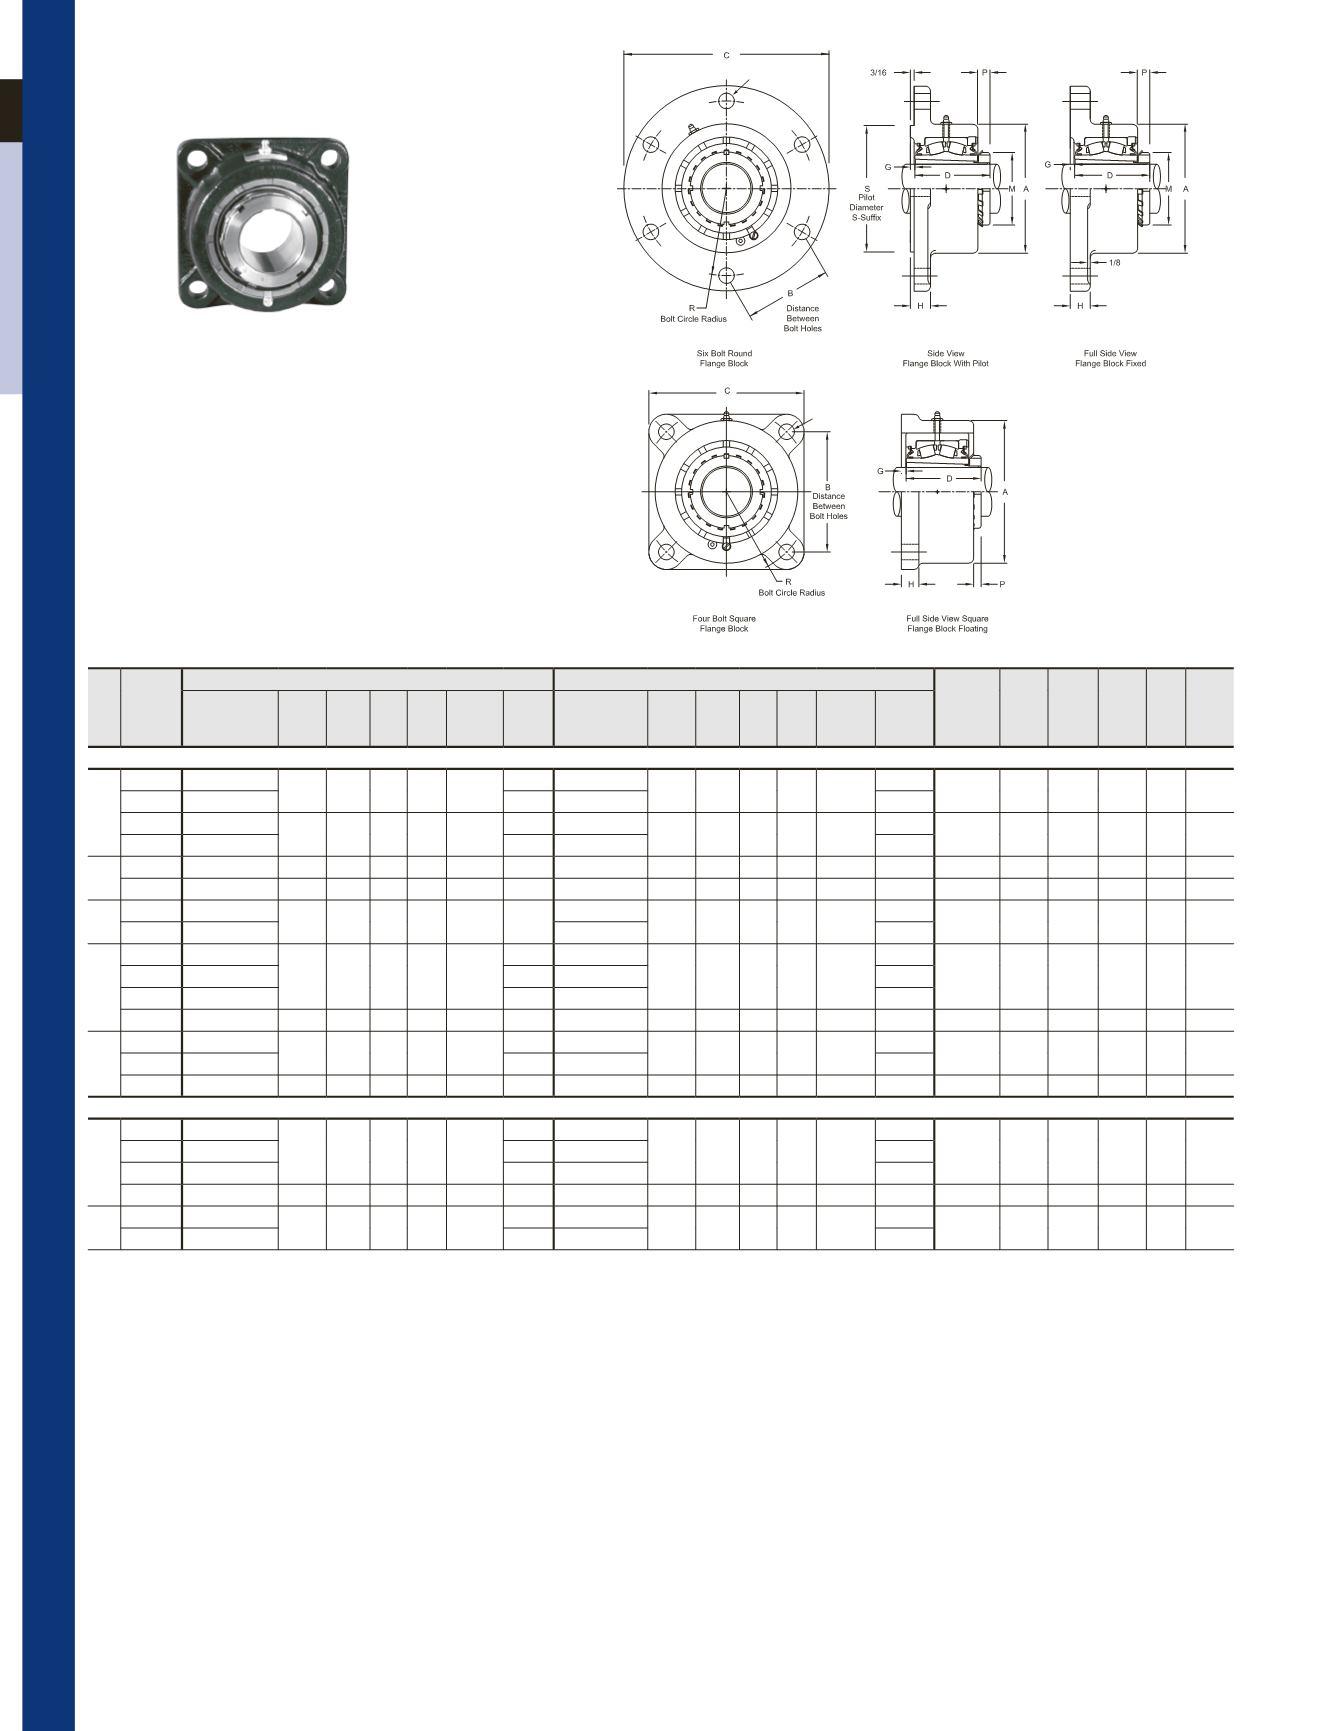 Rexnord Bearings Catalog